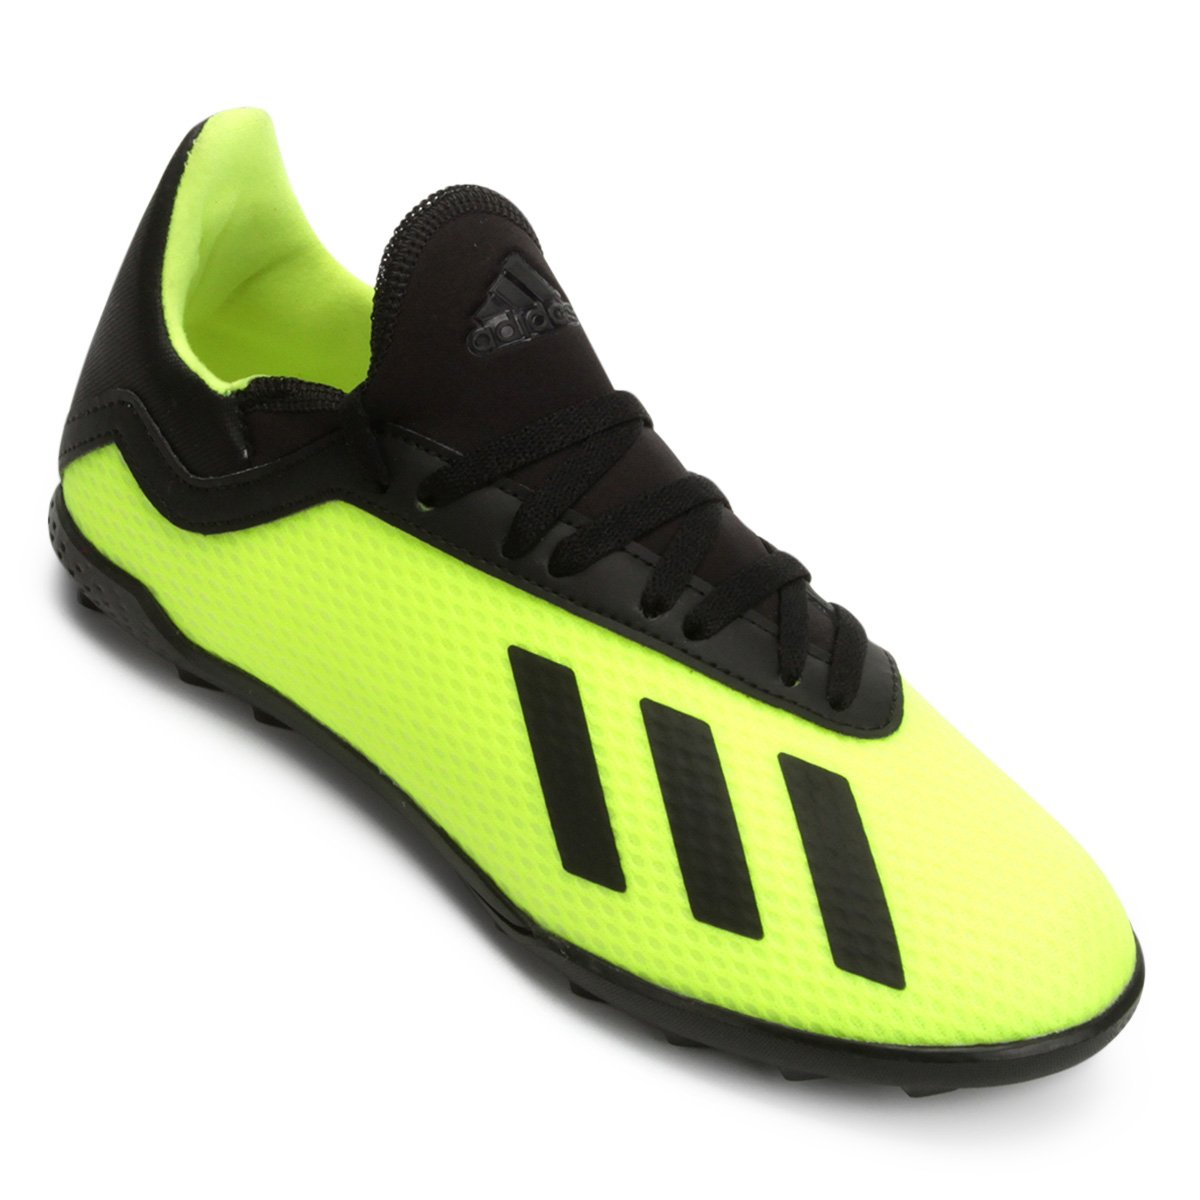 207539cd1c Chuteira Society Infantil Adidas X Tango 18 3 TF